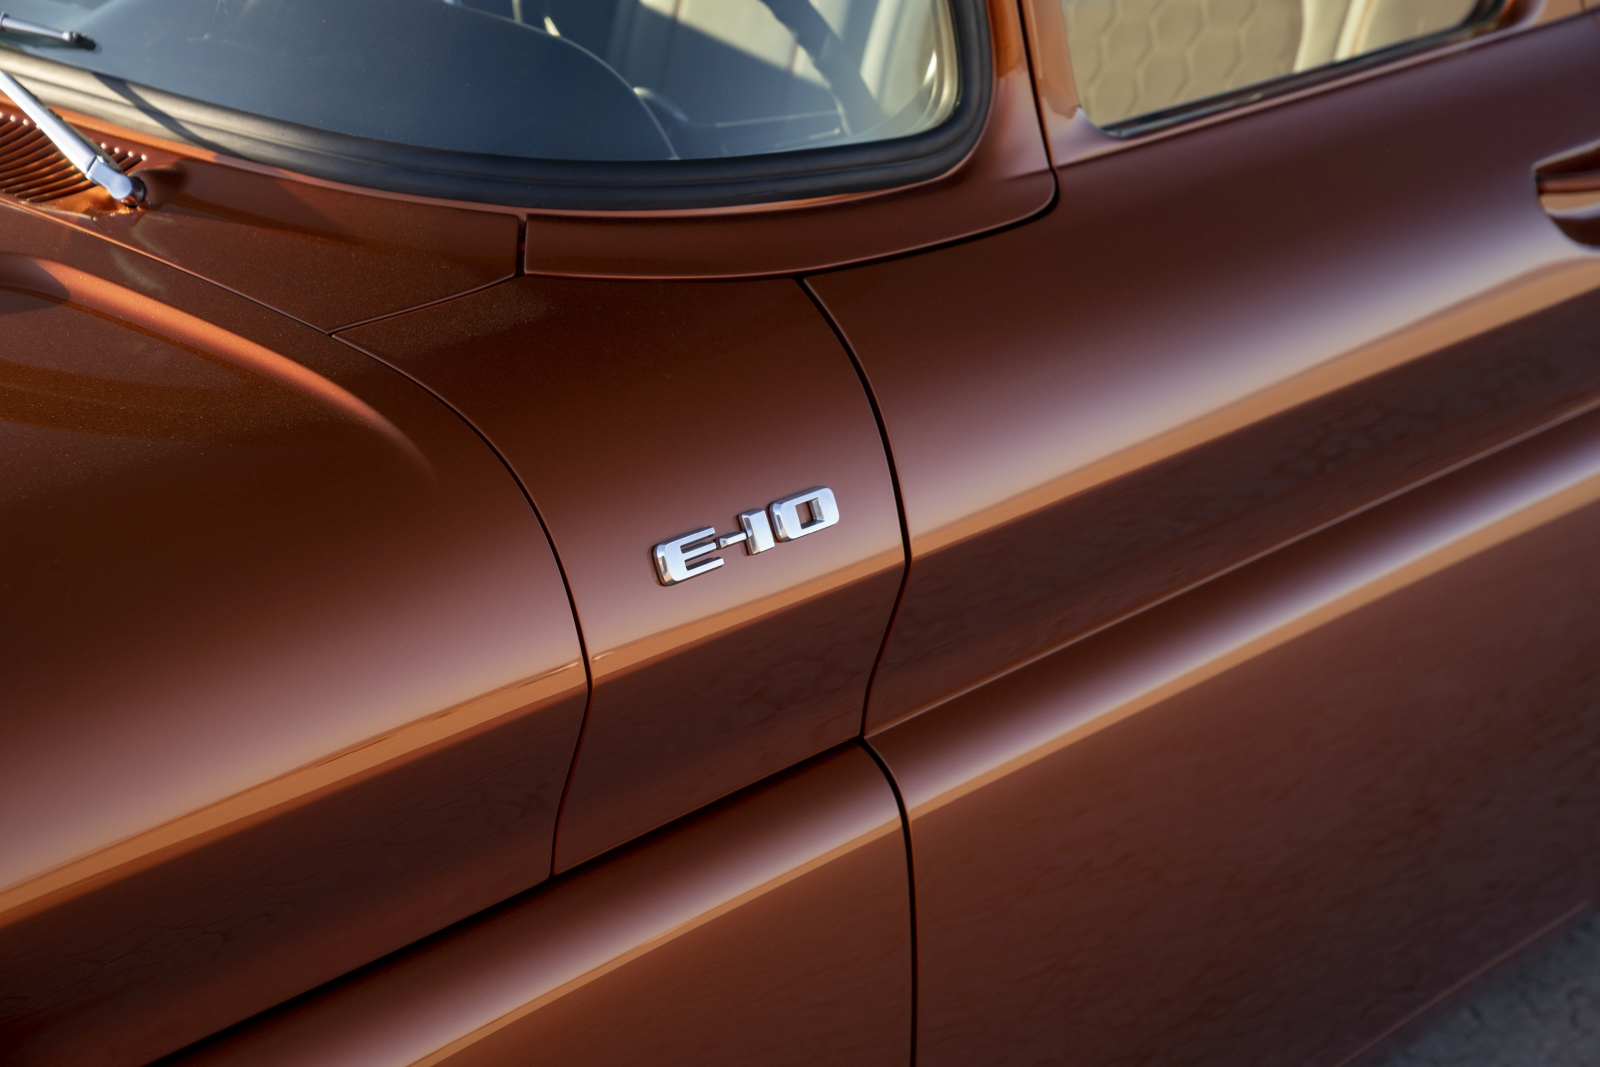 Chevrolet E-10 Concept